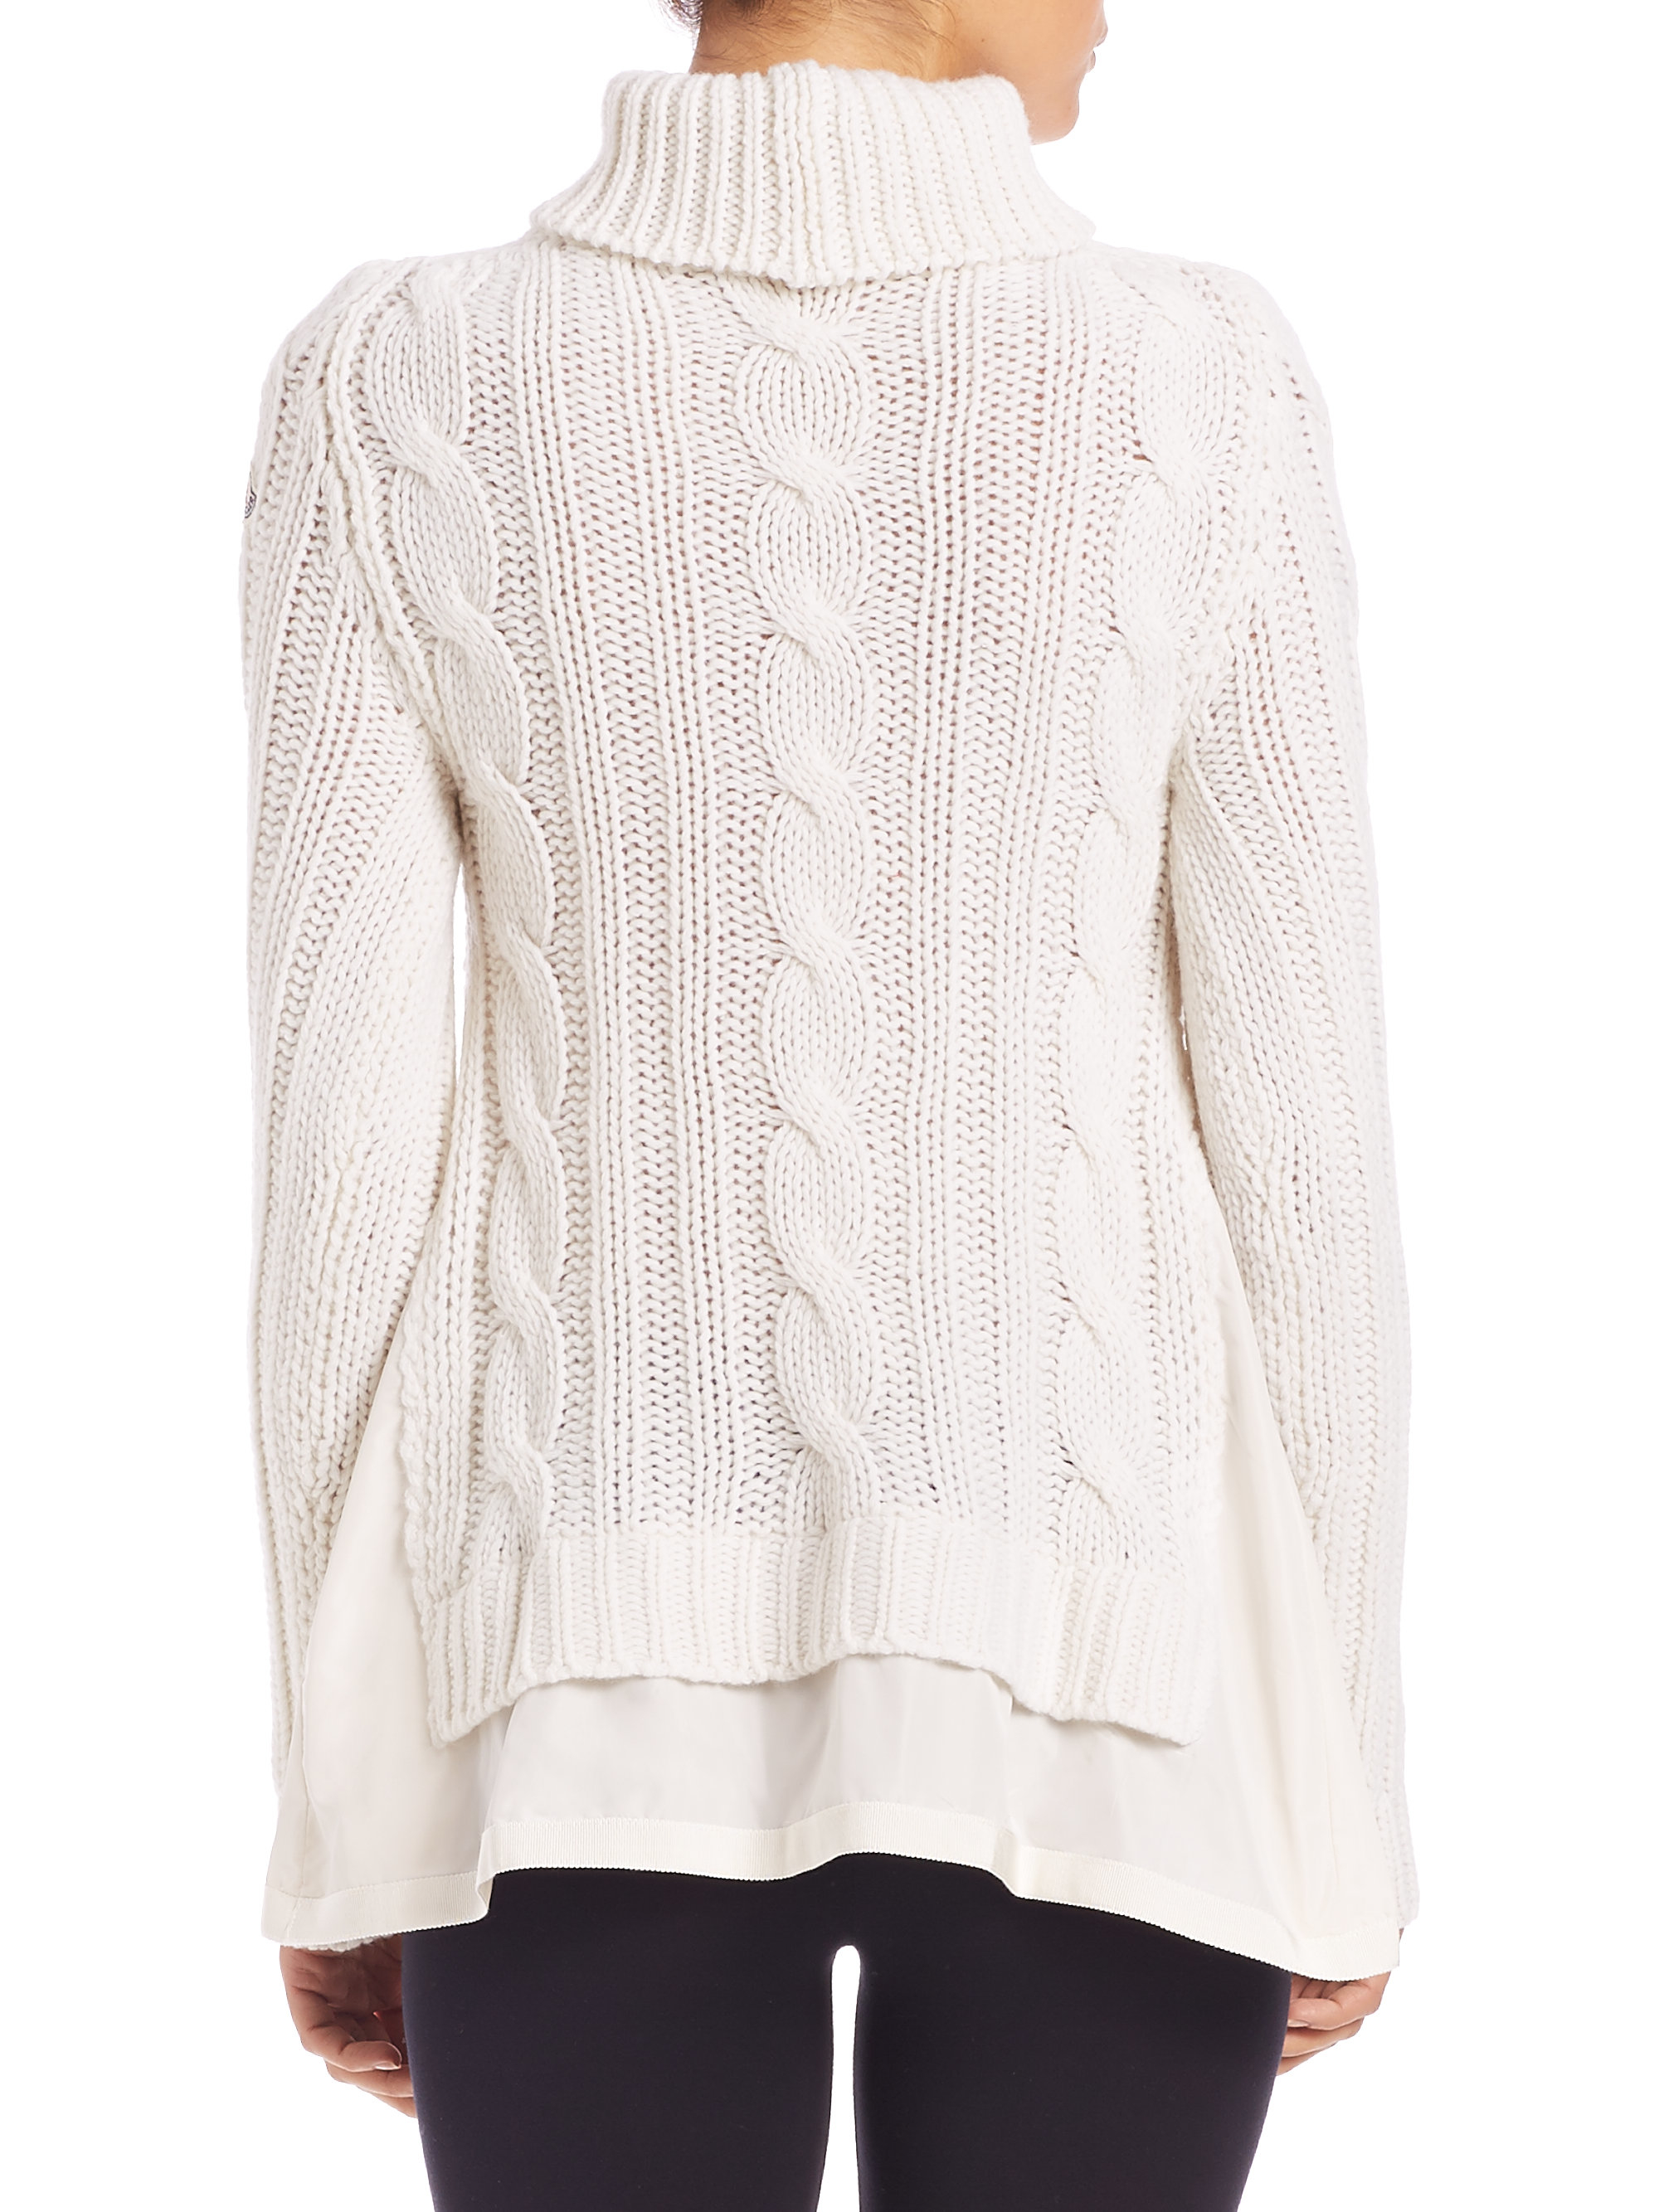 Hem Hemisphere Hemisphere Flared Hem Flared Hem Hemisphere Sweater Flared Sweater Sweater Gris Gris AHf15wx16q